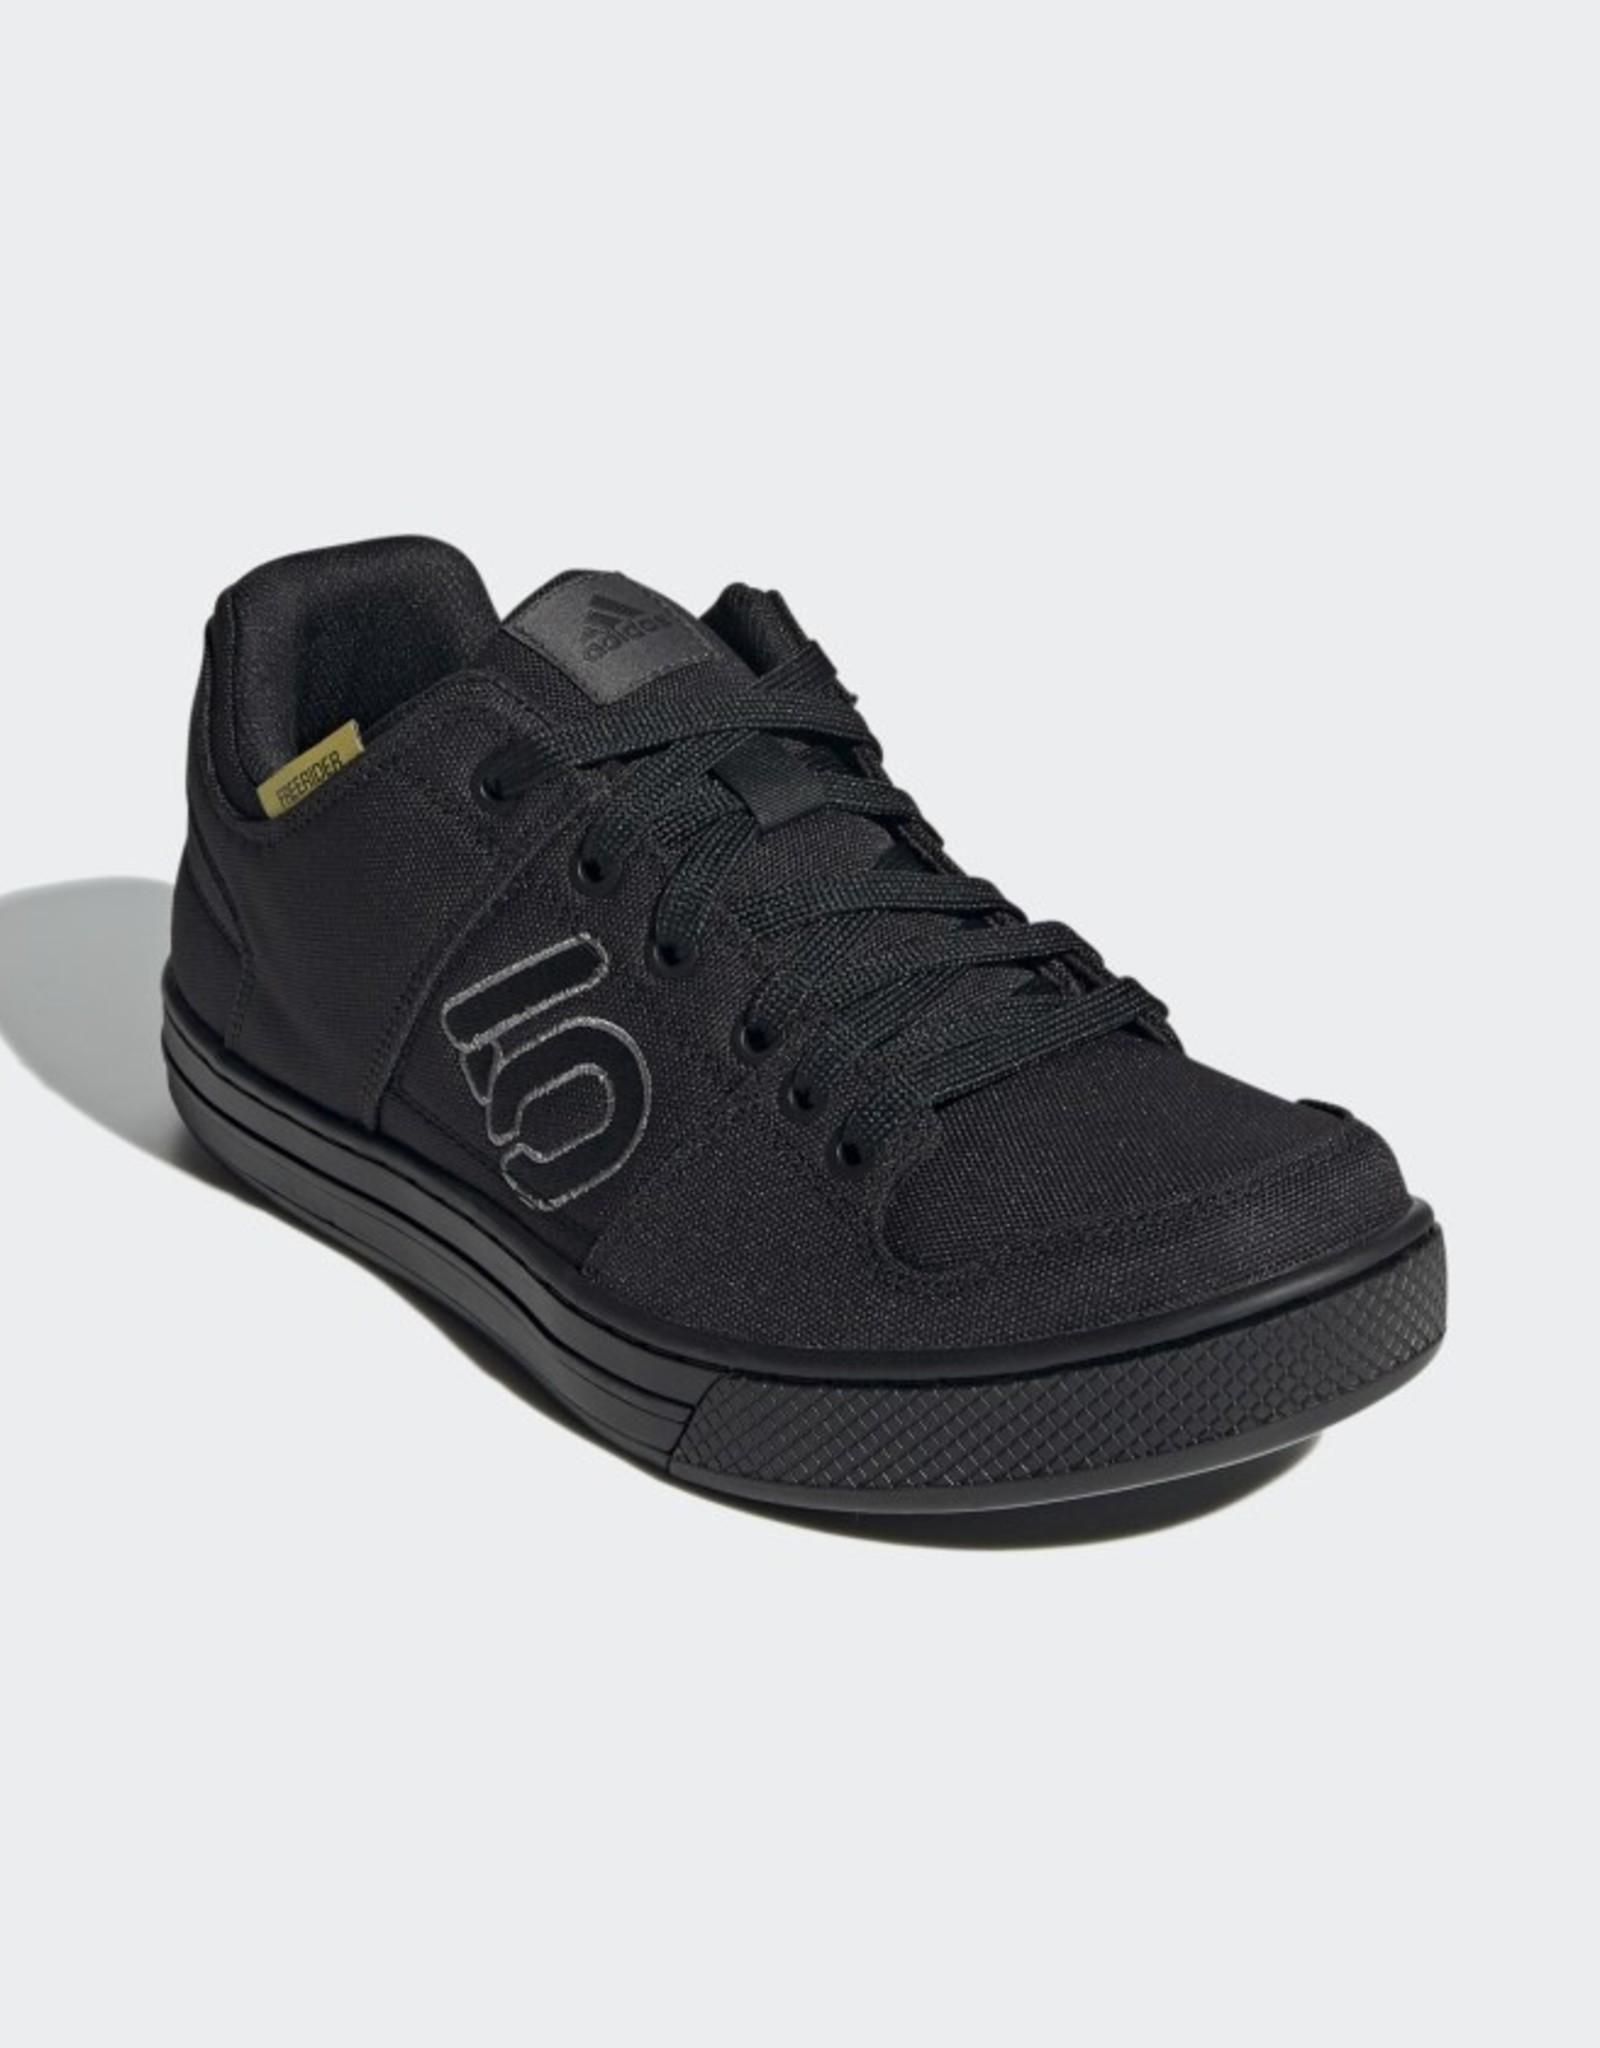 Five Ten Freerider Flat MTB Shoe